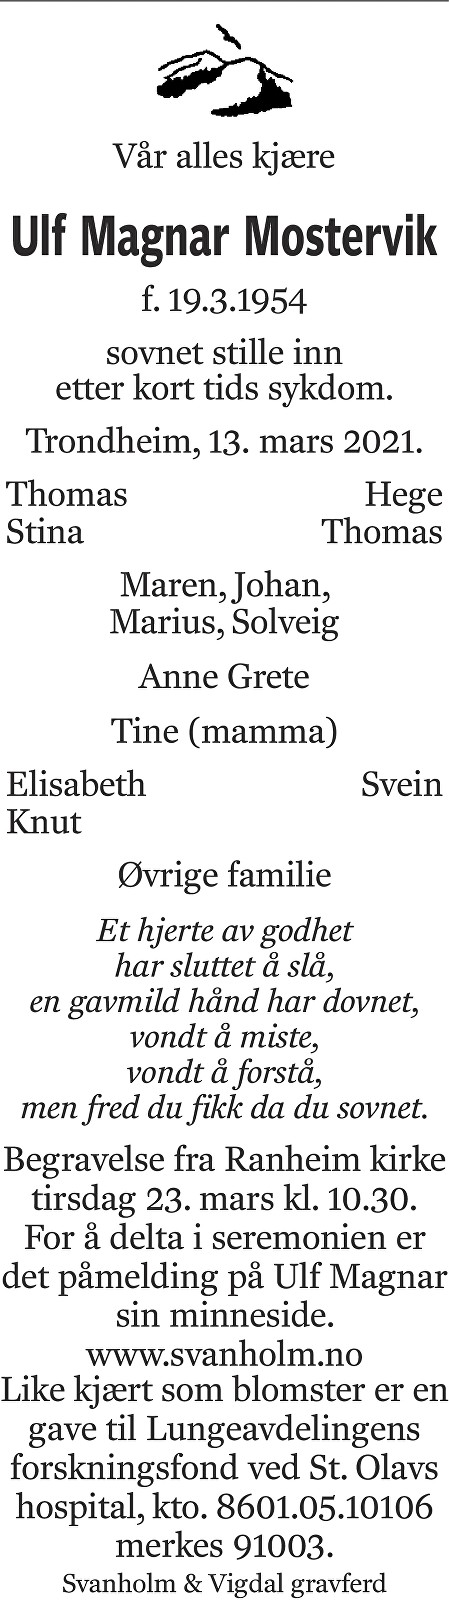 Ulf Magnar Mostervik Dødsannonse